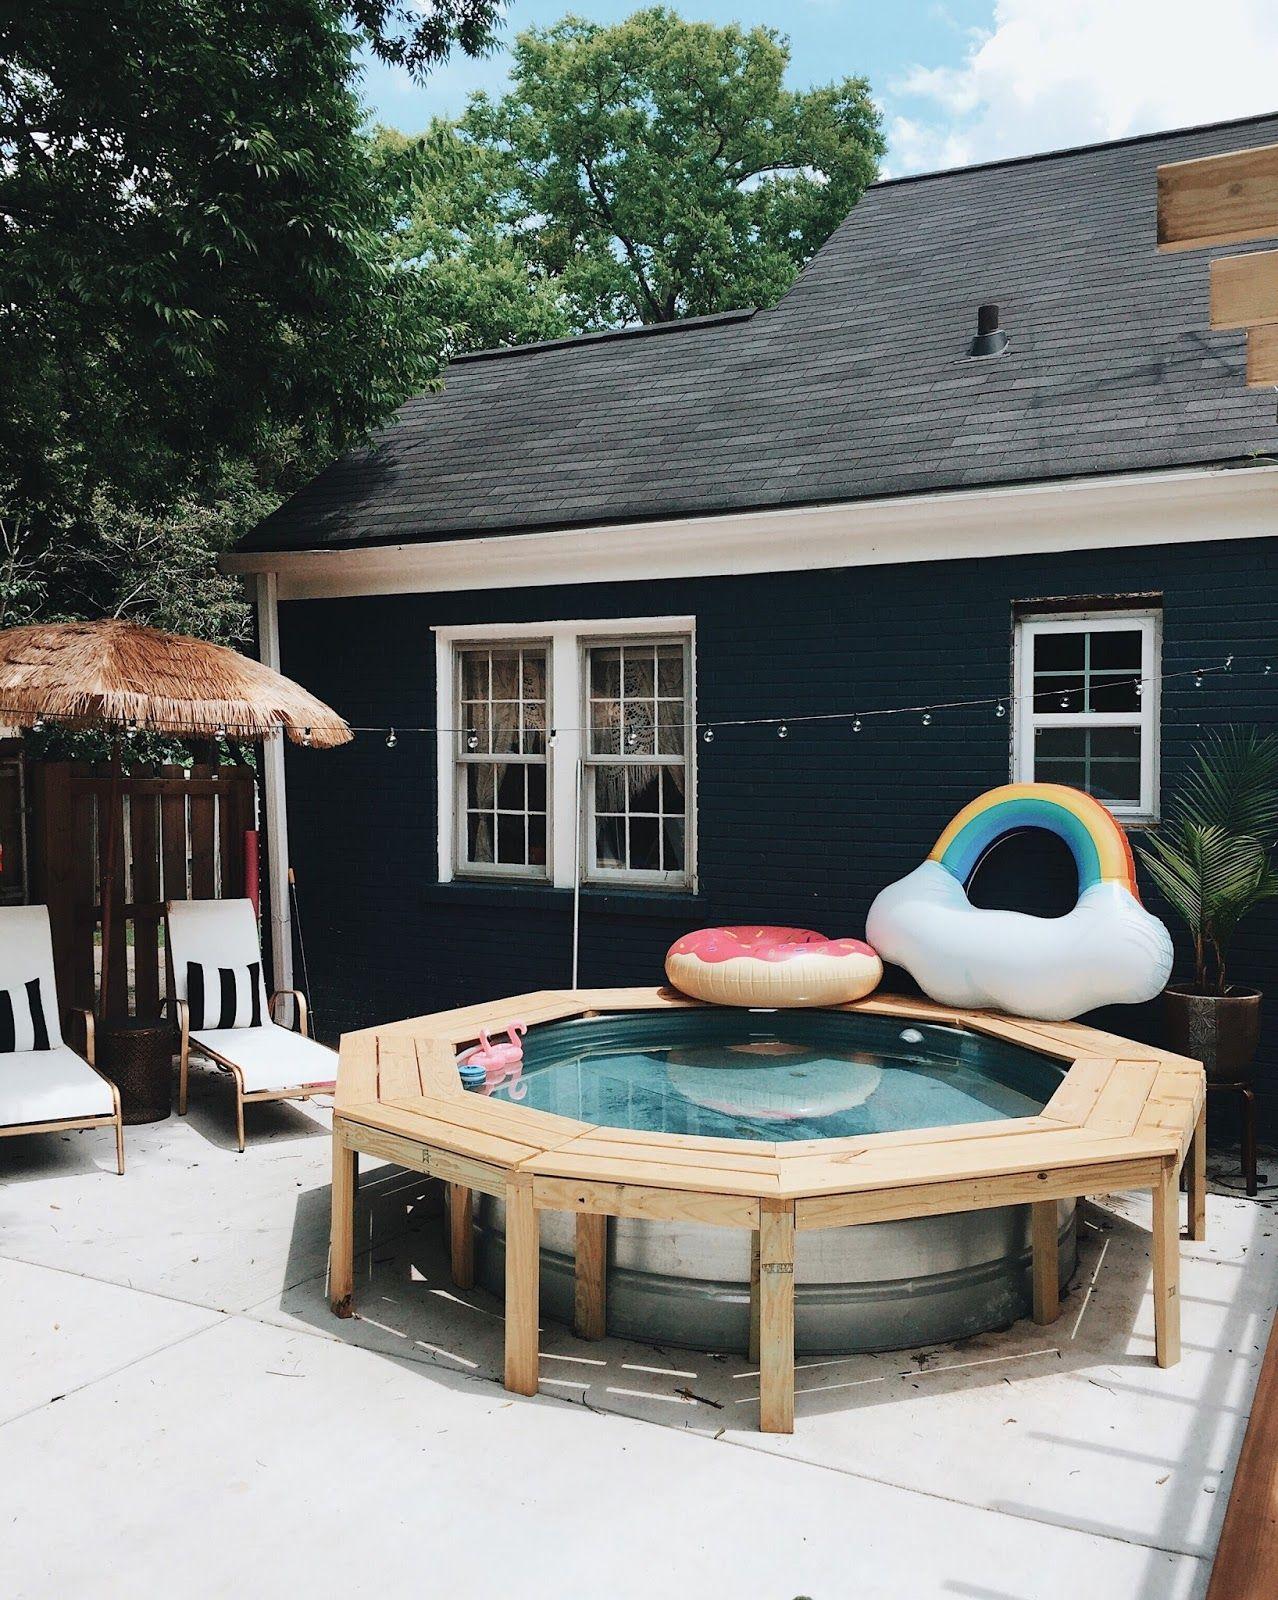 Diy stock tank pool bench in 2020 hot tub backyard